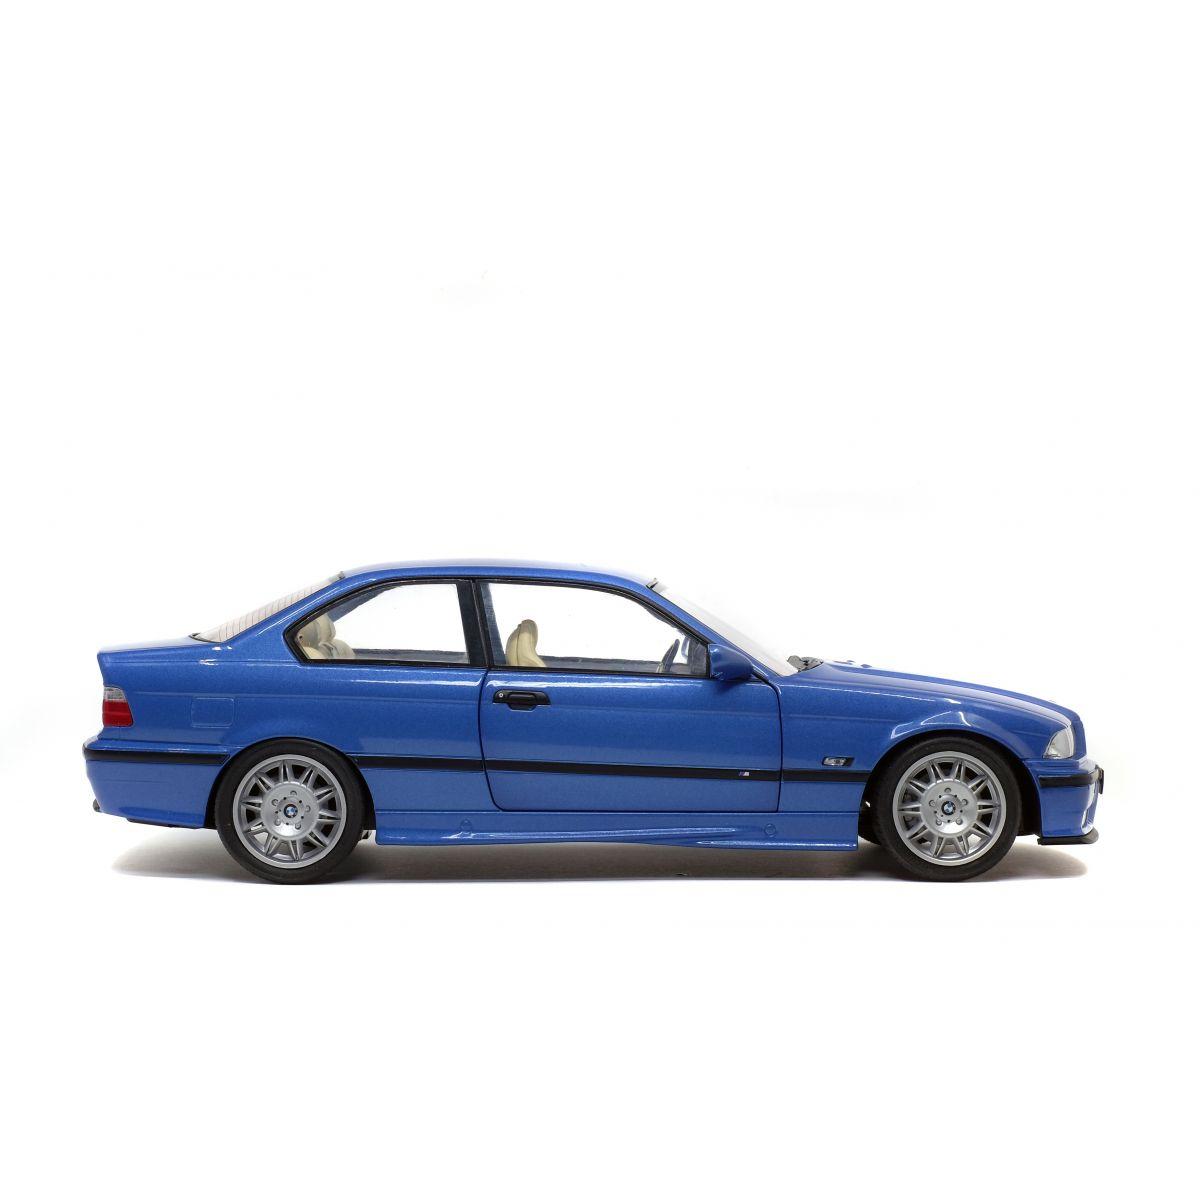 BMW E36 Coupe M3 Bleu Estoril 1990 1/18